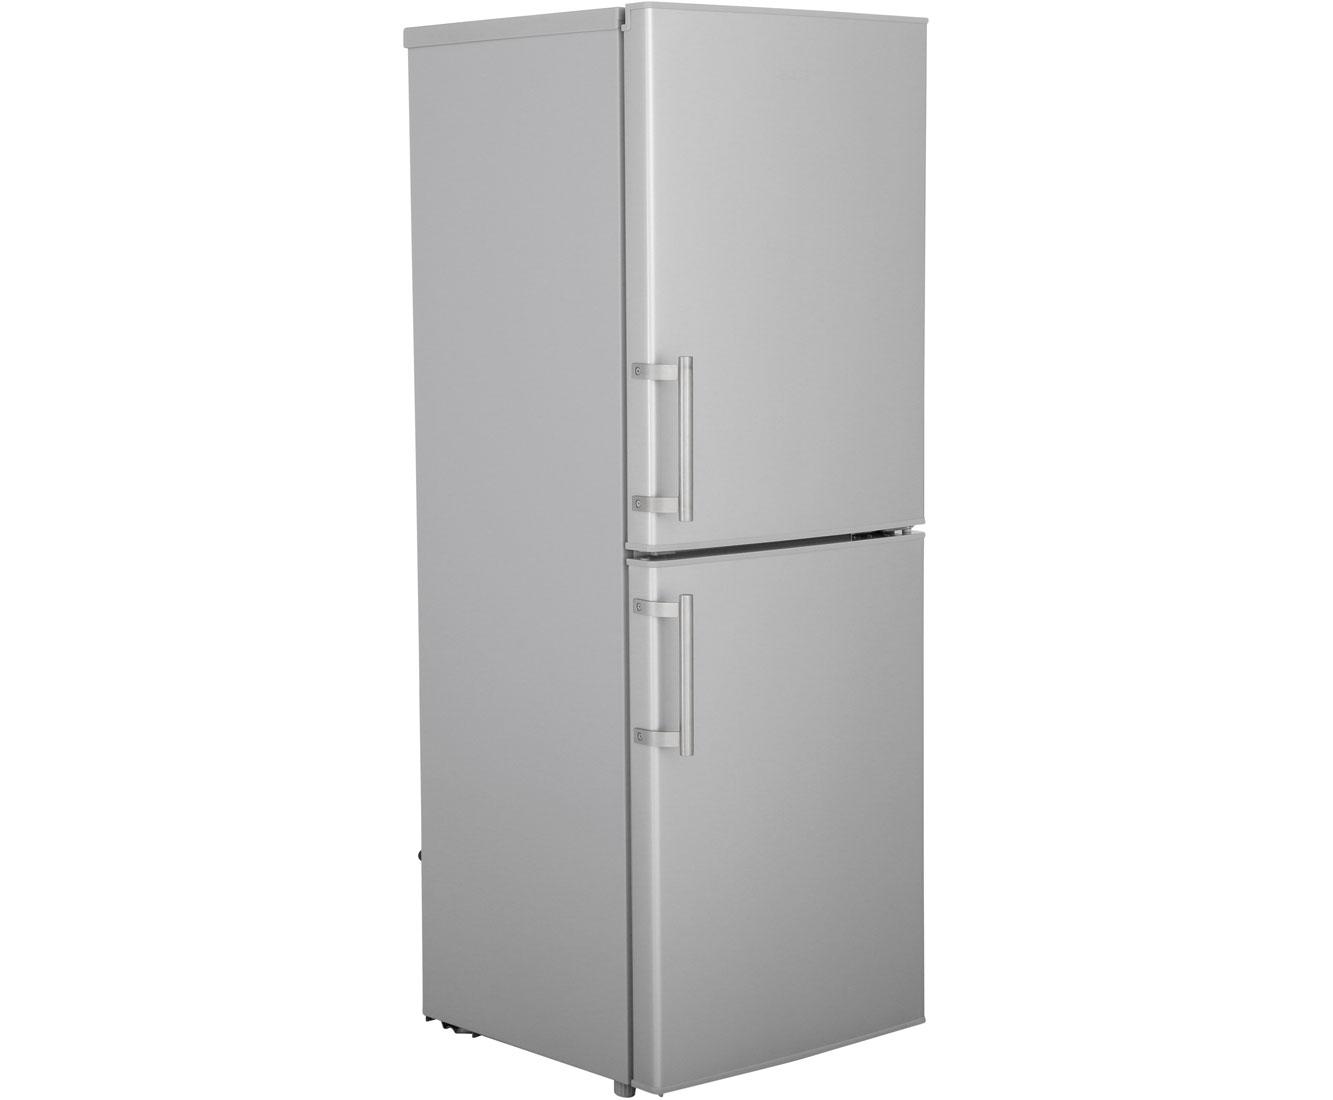 Retro Kühlschrank Hofer : Kühl gefrierschränke hofer gefrierschrank nordfrost kühl